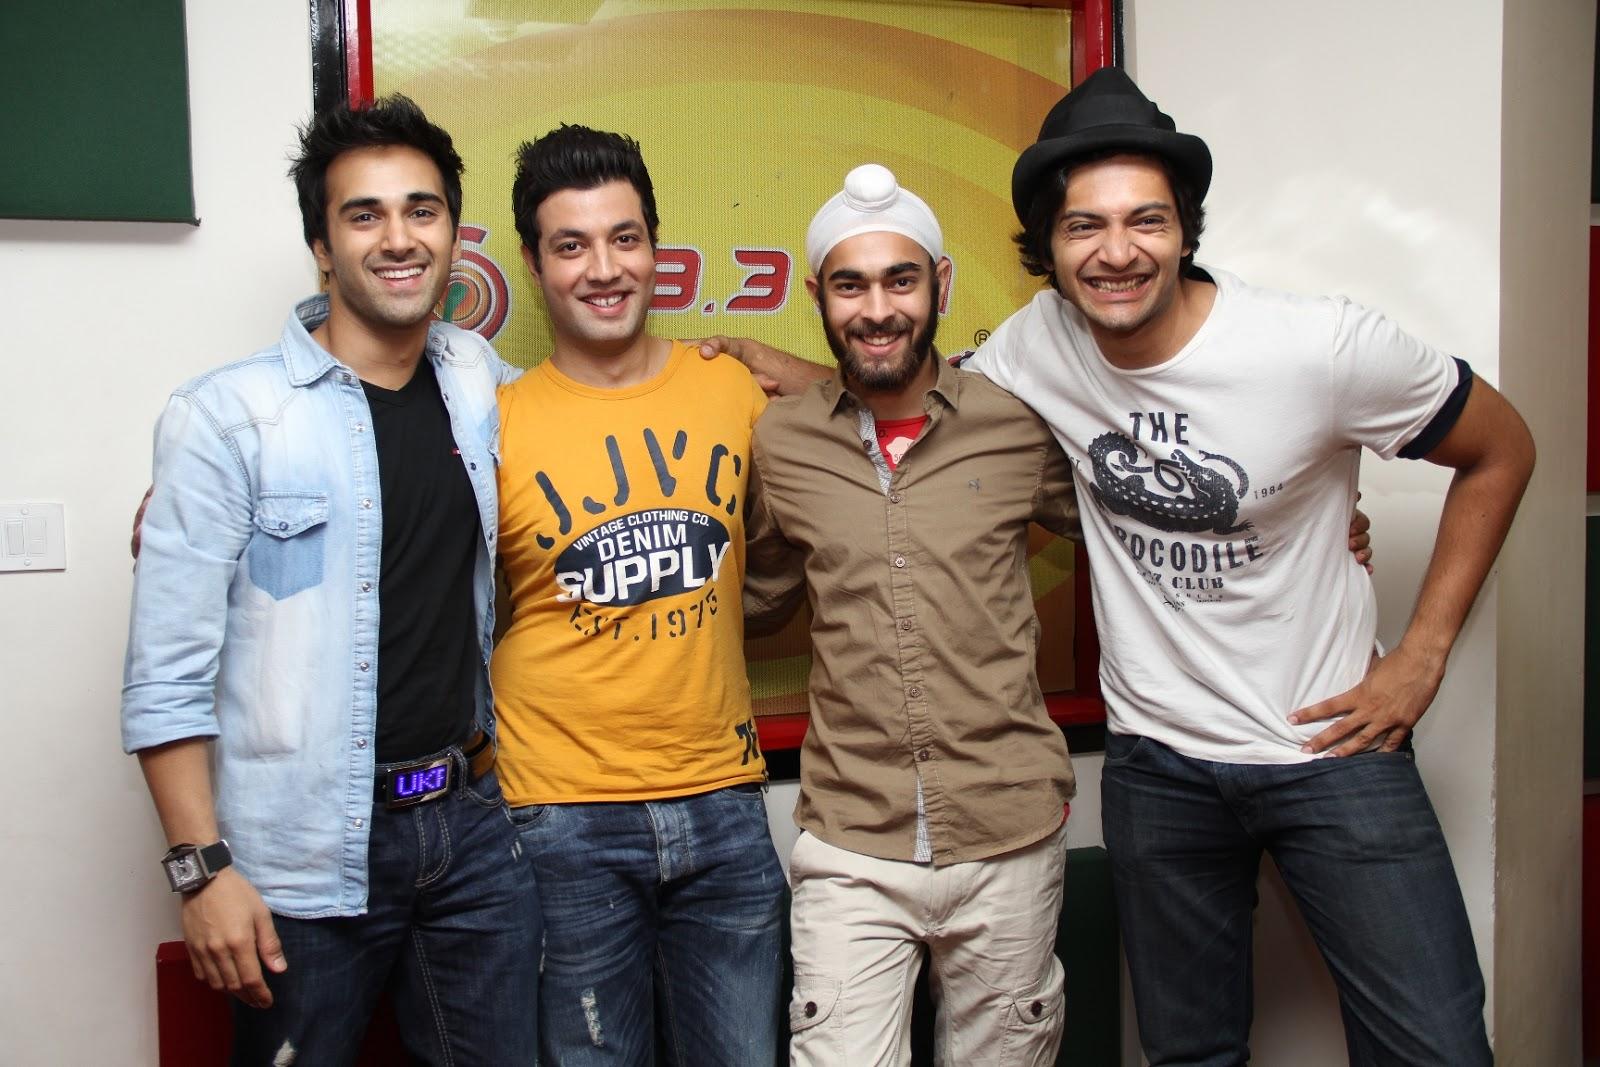 team-fukrey-at-radio-mirchi-mumbai-studio-for-movie-promotion-2